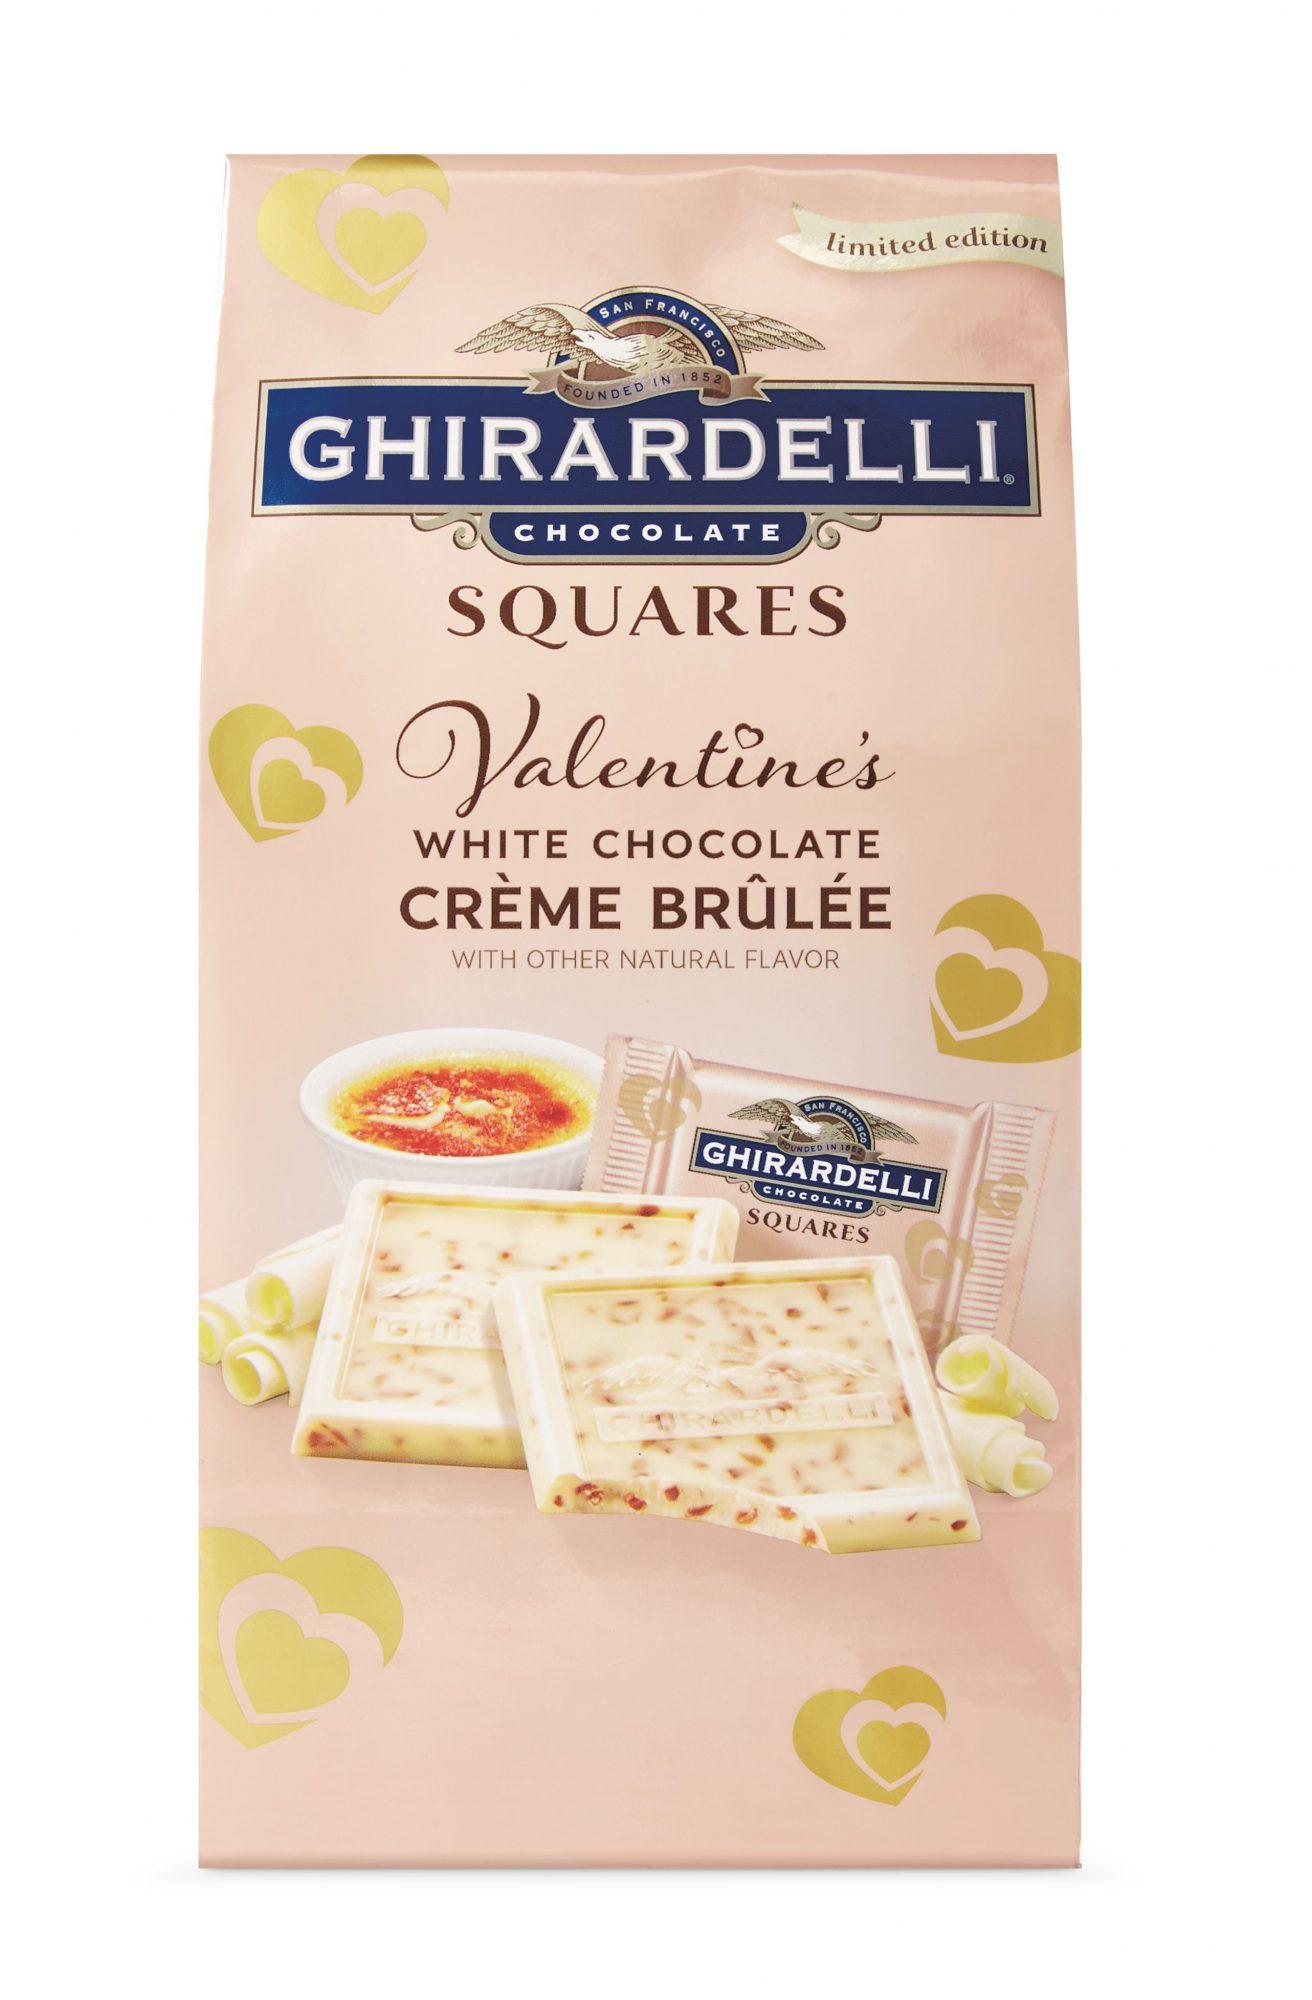 ghirardelli-valentines-day-white-chocolate-creme-brulee-bag-1.jpg